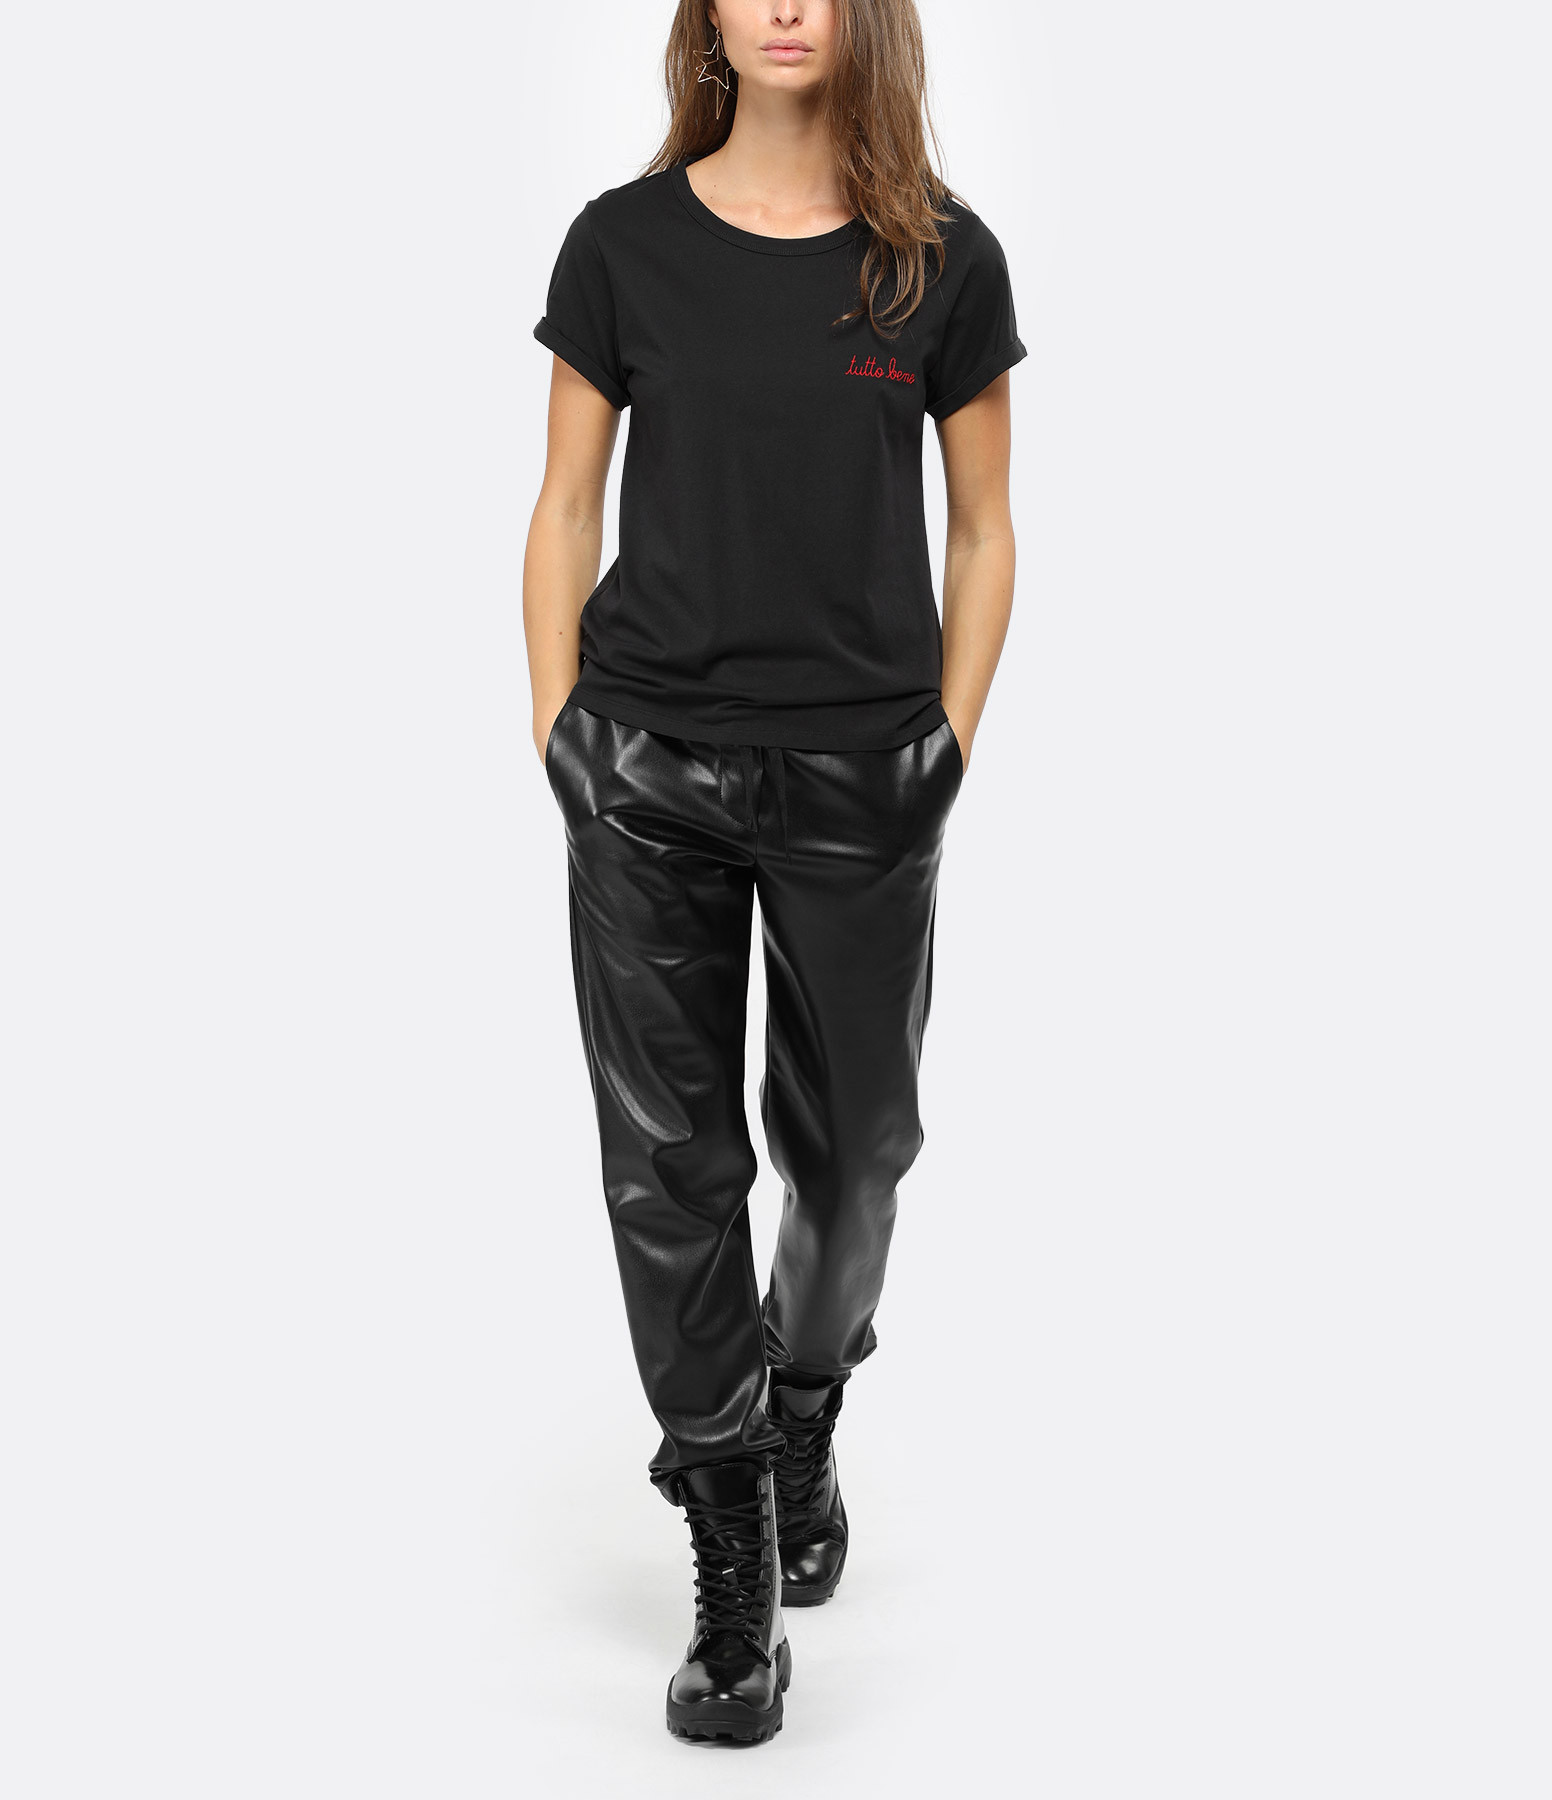 MAISON LABICHE - Tee-shirt Tutto Bene Noir